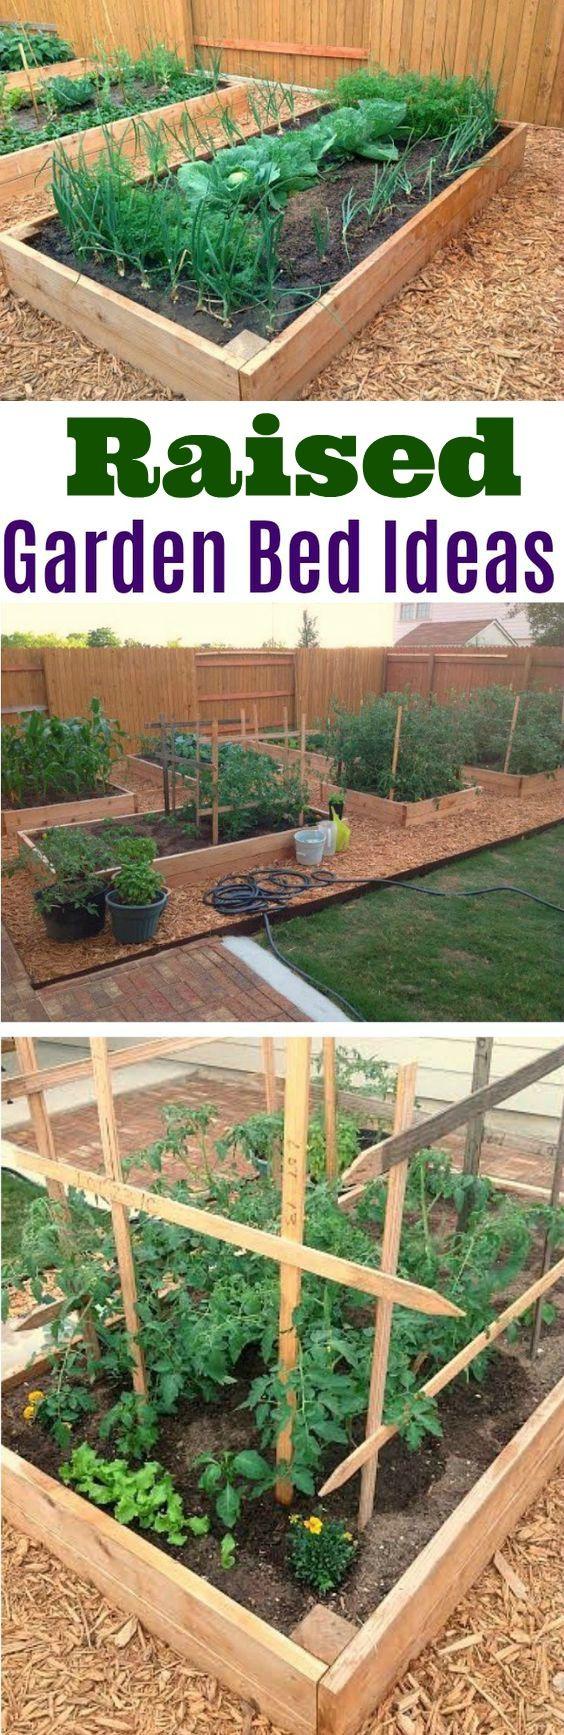 Raised Garden Bed Ideas, Garden Box Ideas, Gardening Ideas